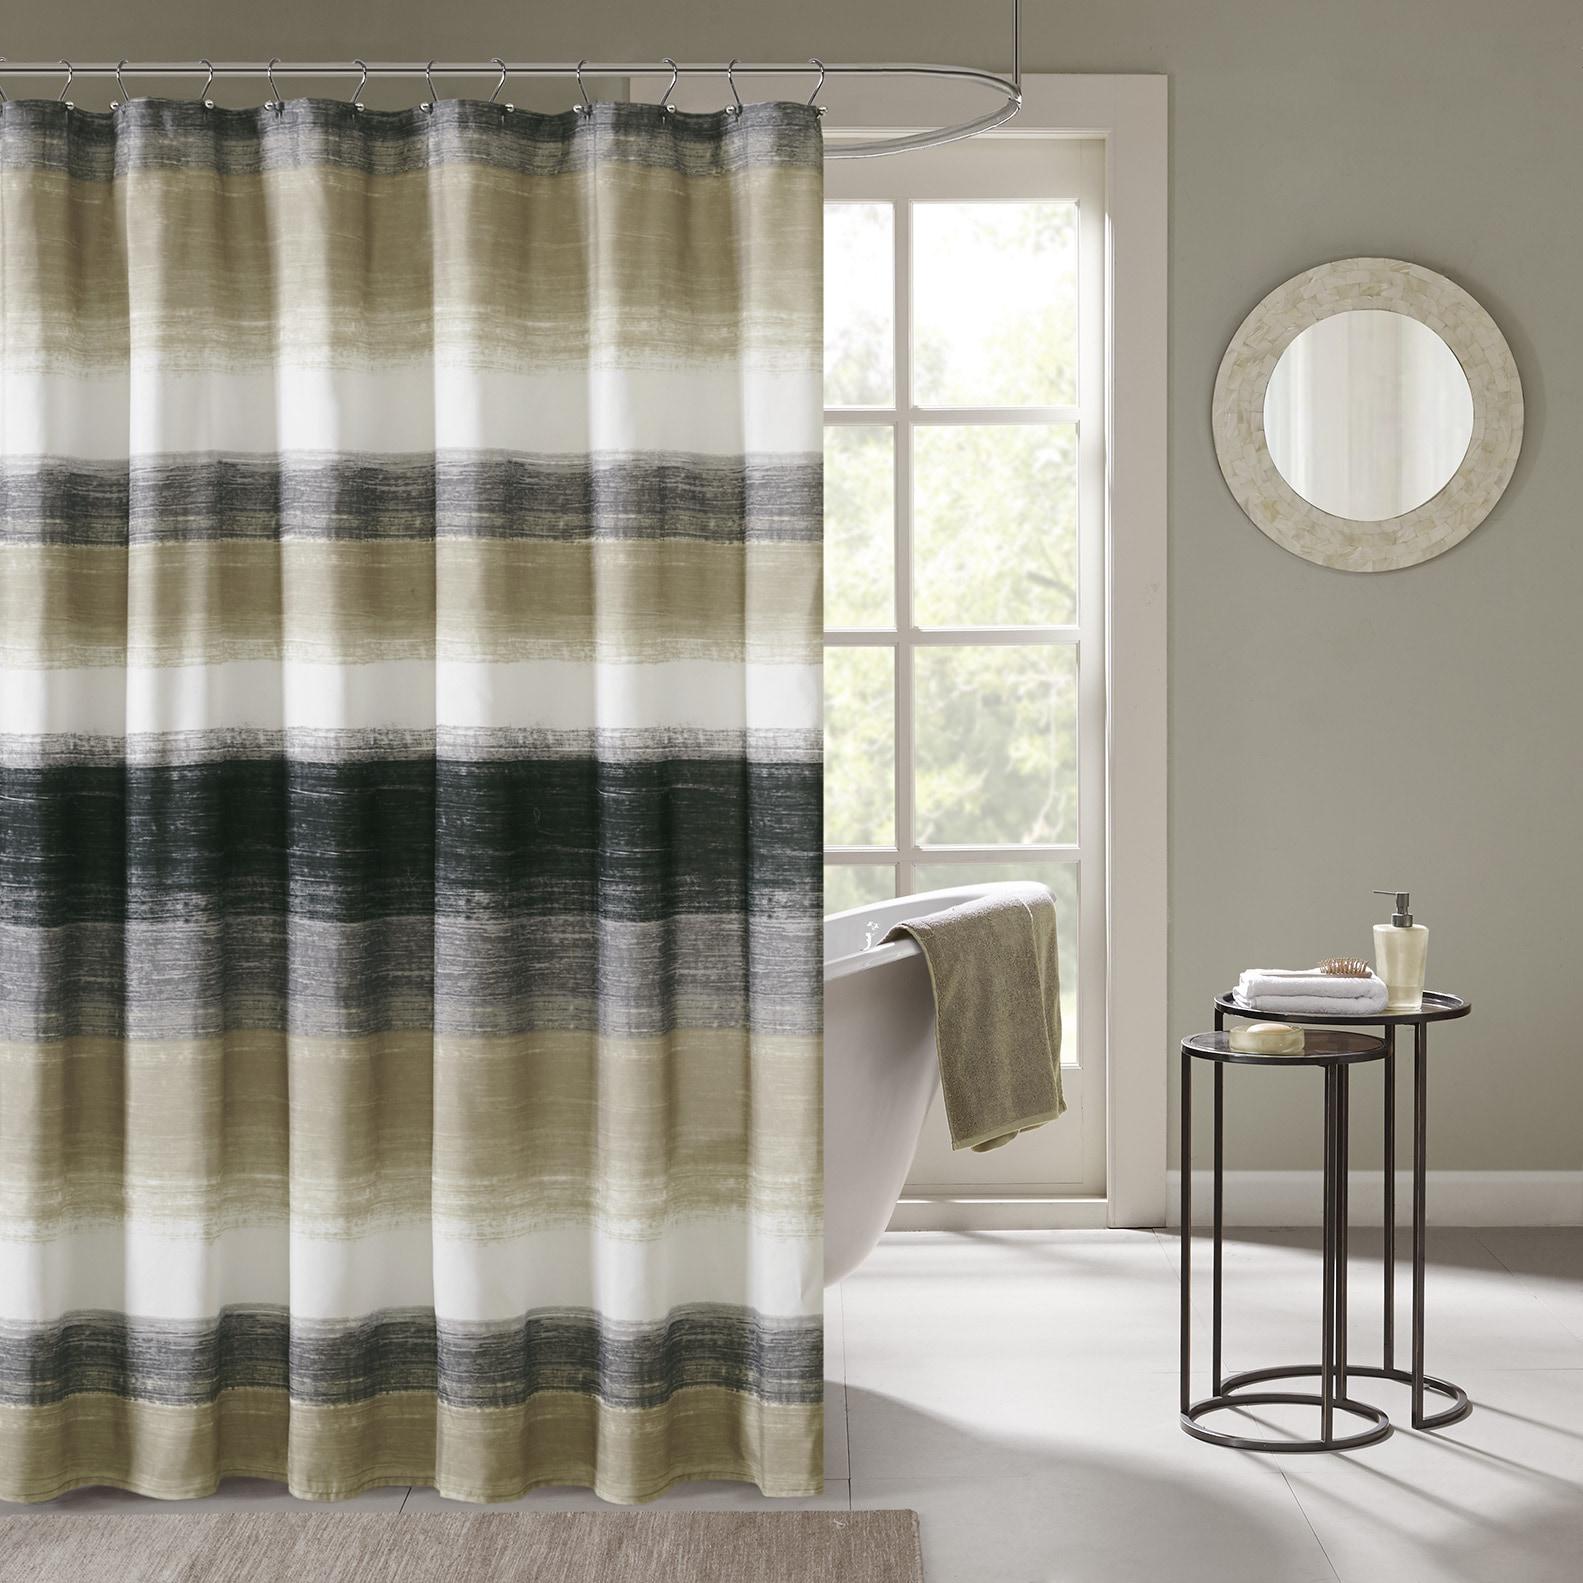 Carson Carrington Jutland Printed Taupe Olive Shower Curtain